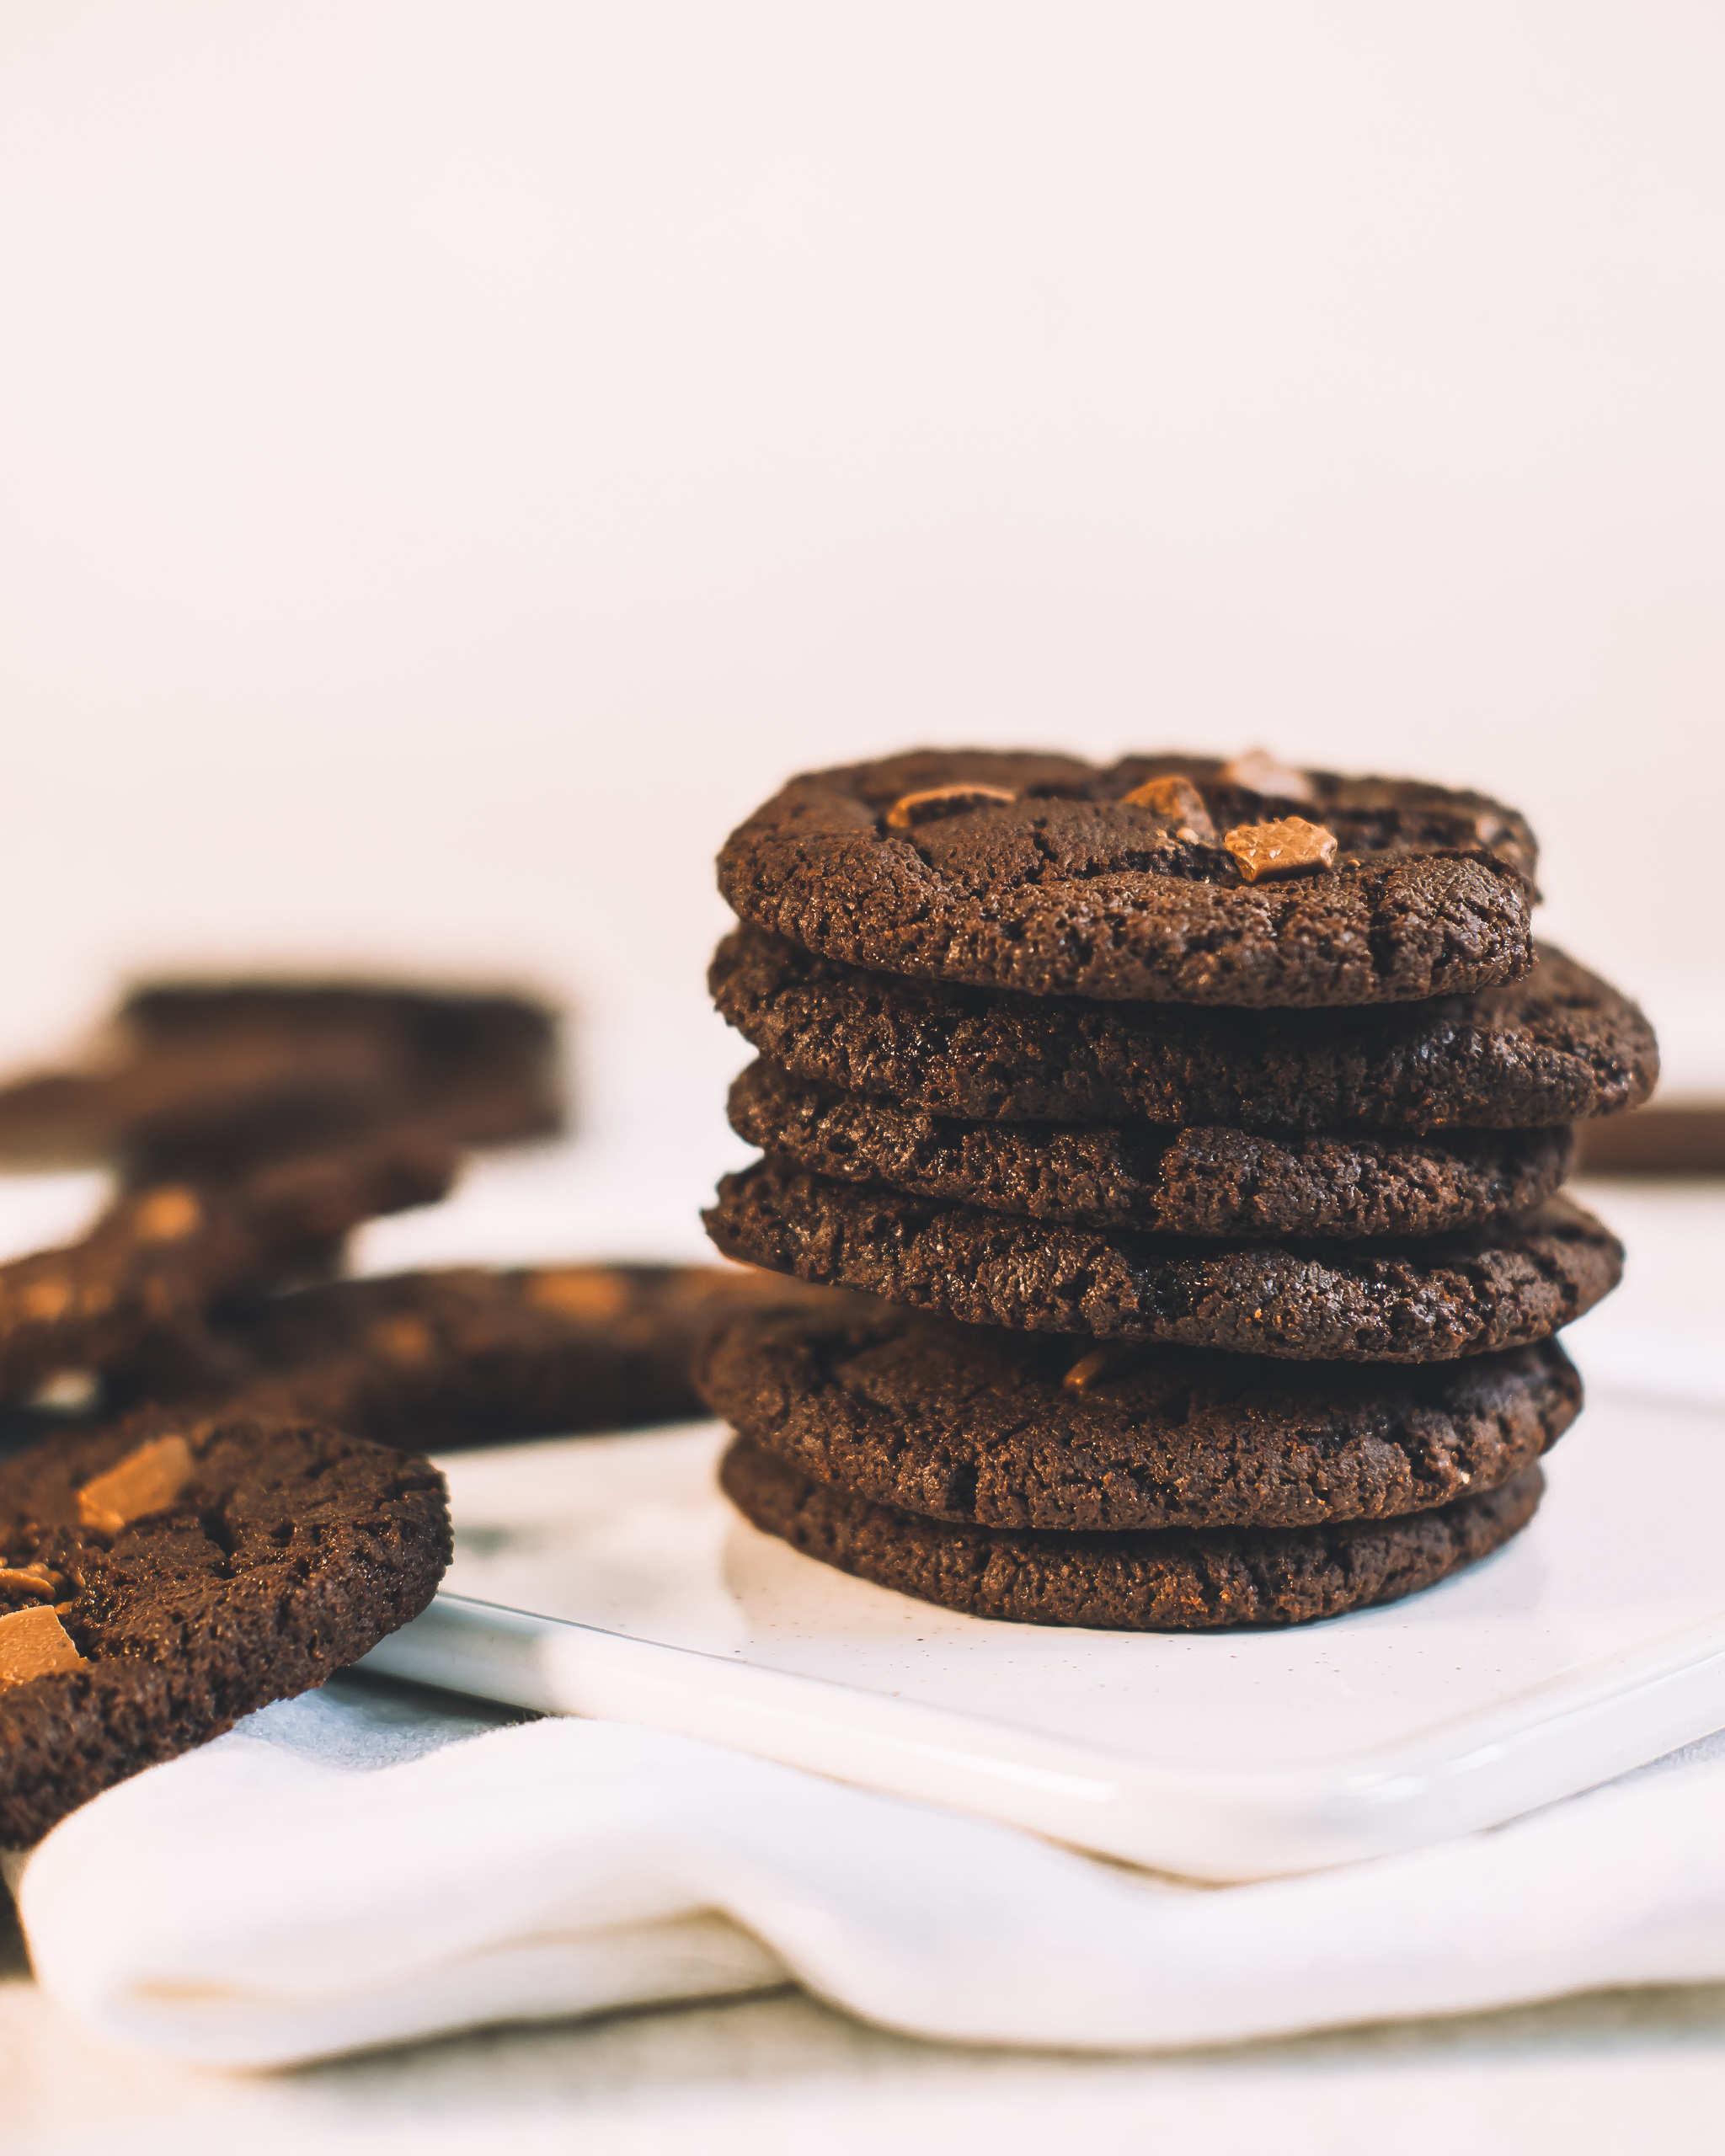 Recept för chocolate chip cookies